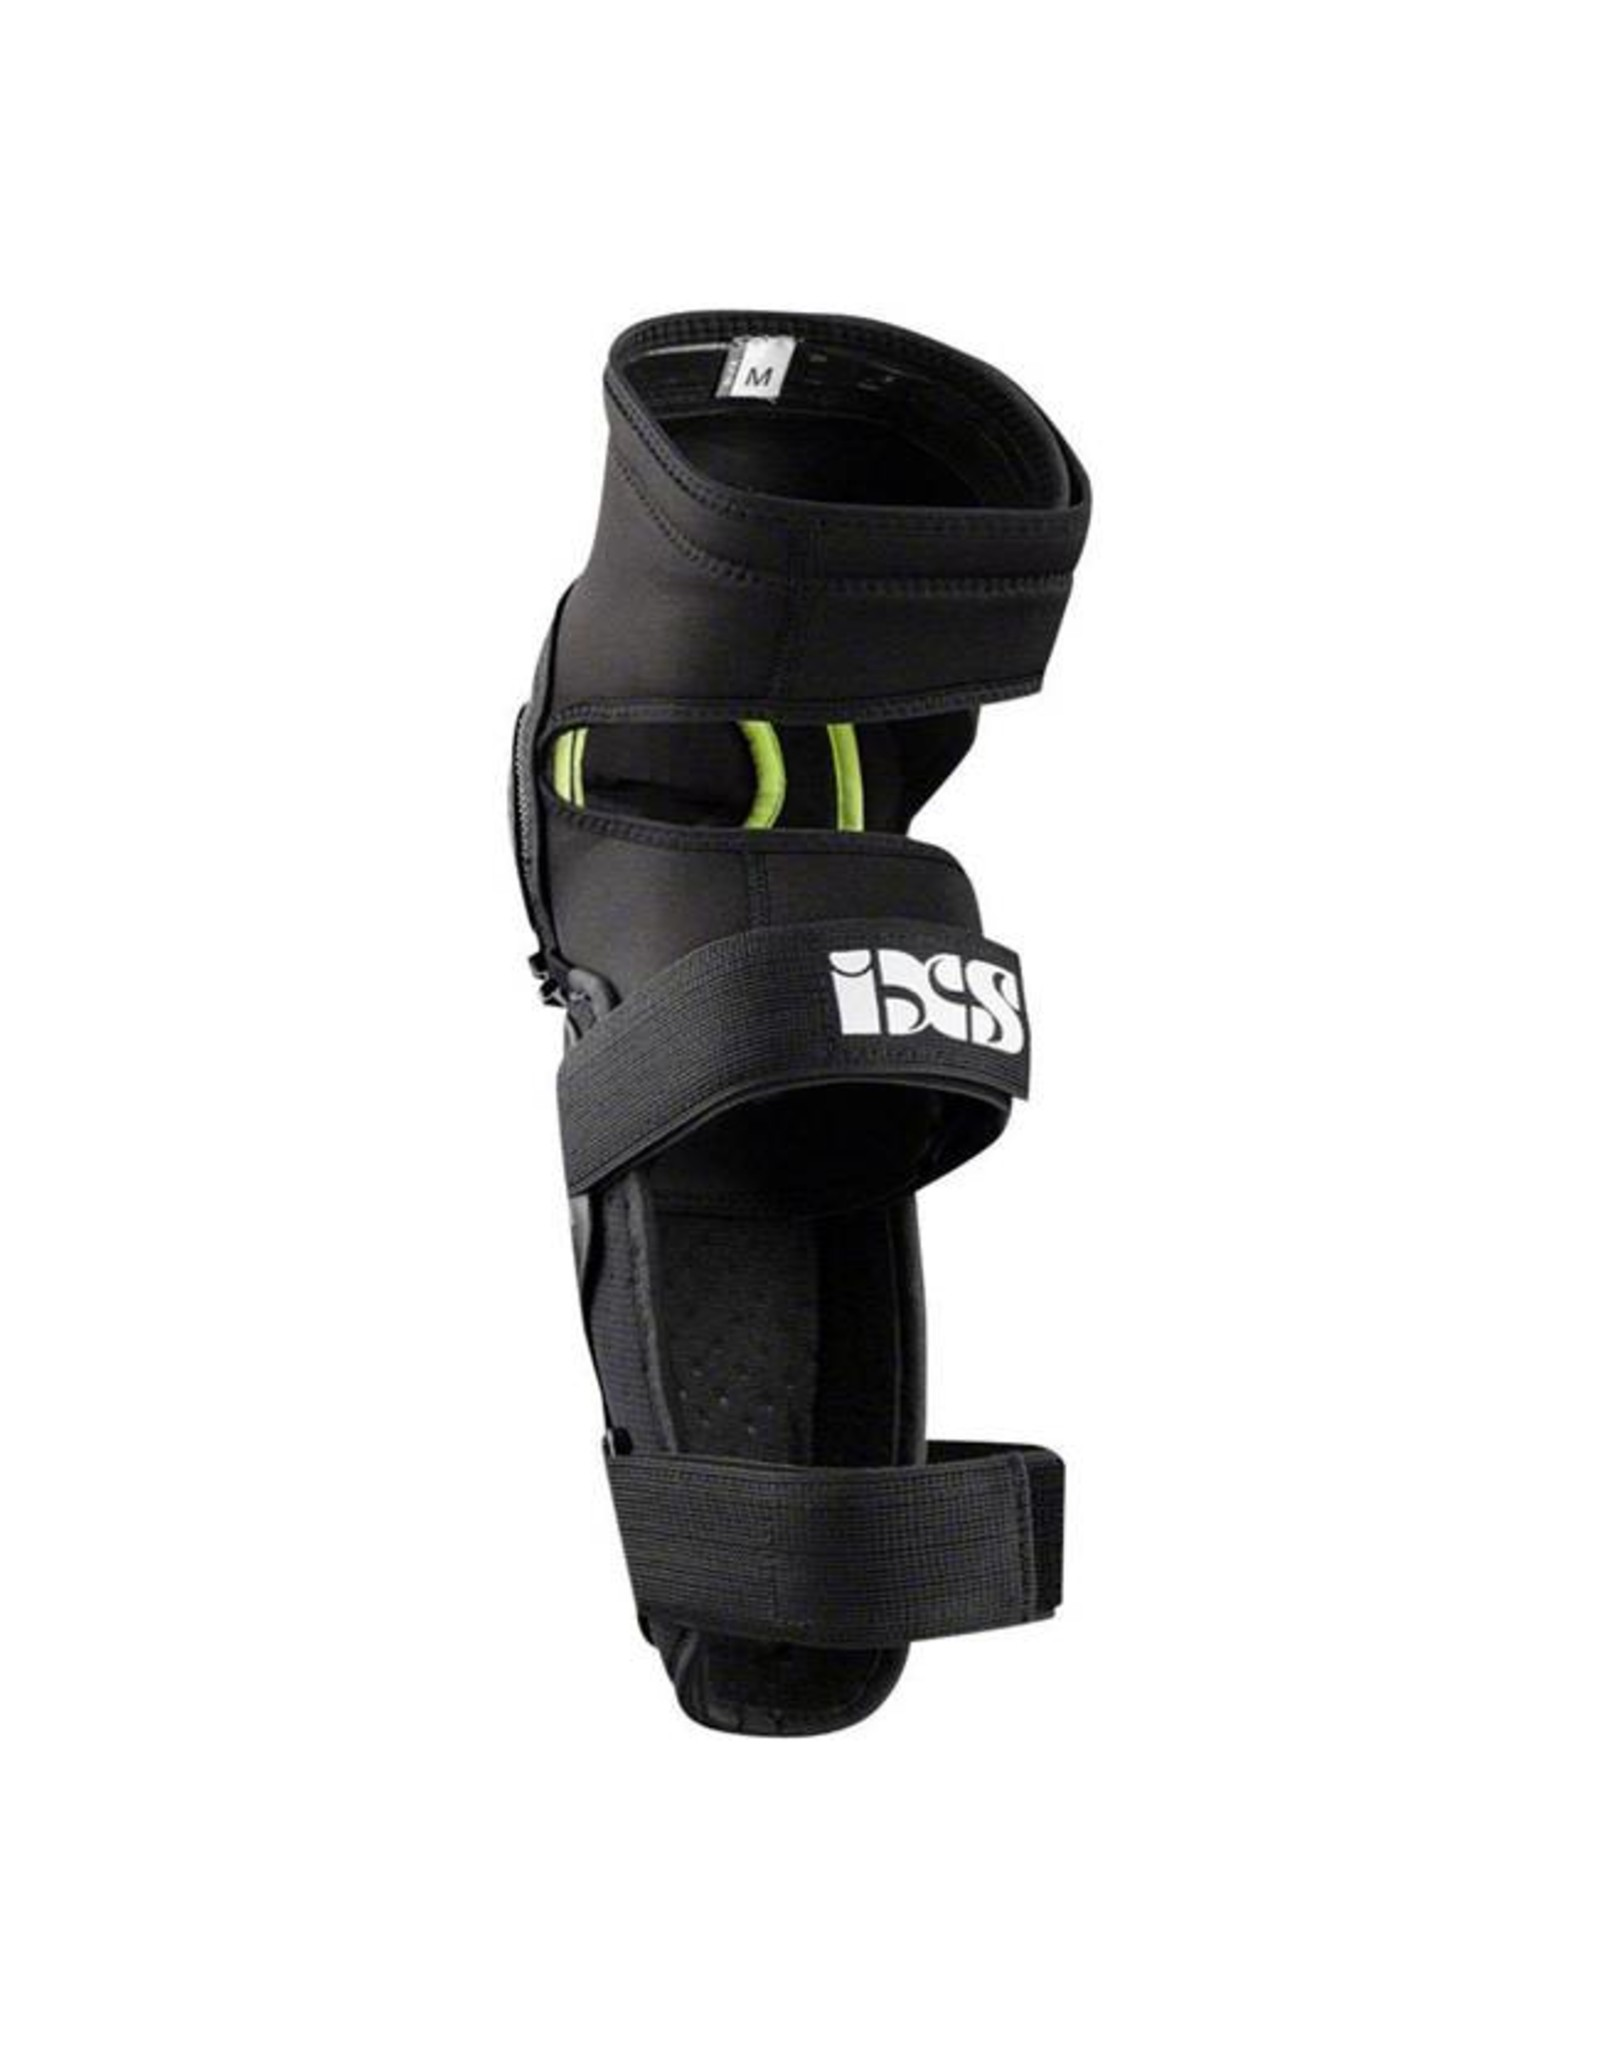 IXS iXS Mallet Knee/Shin Guard: Black, LG